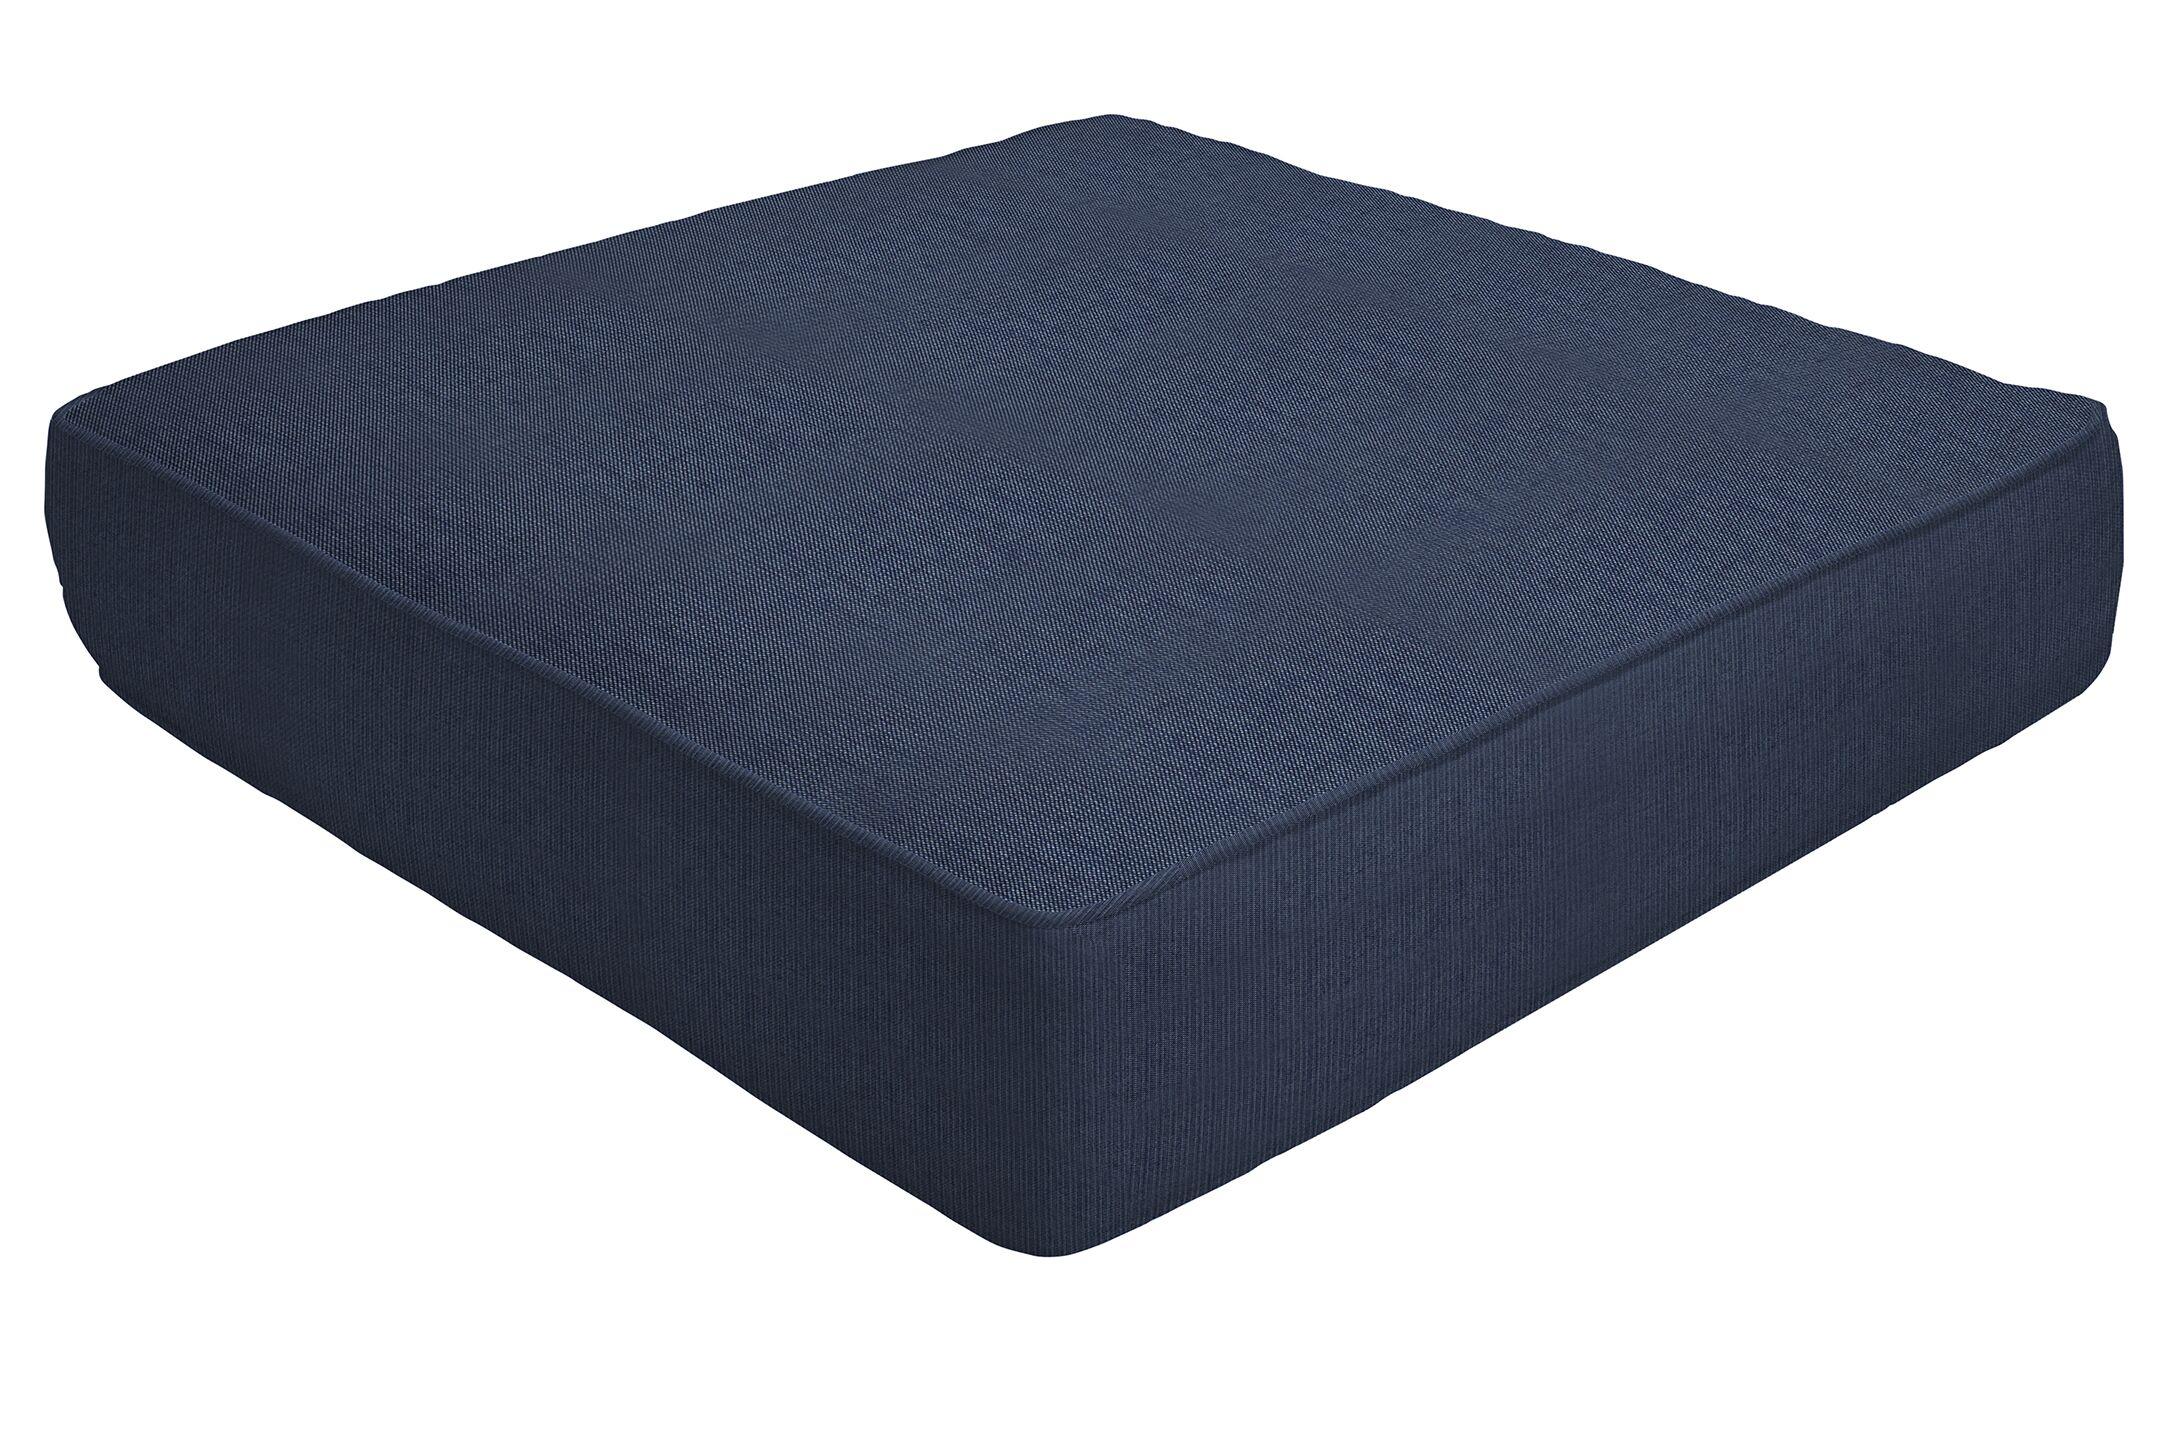 Double Piped Indoor/Outdoor Sunbrella Ottoman Cushion Fabric: Indigo, Size: 5